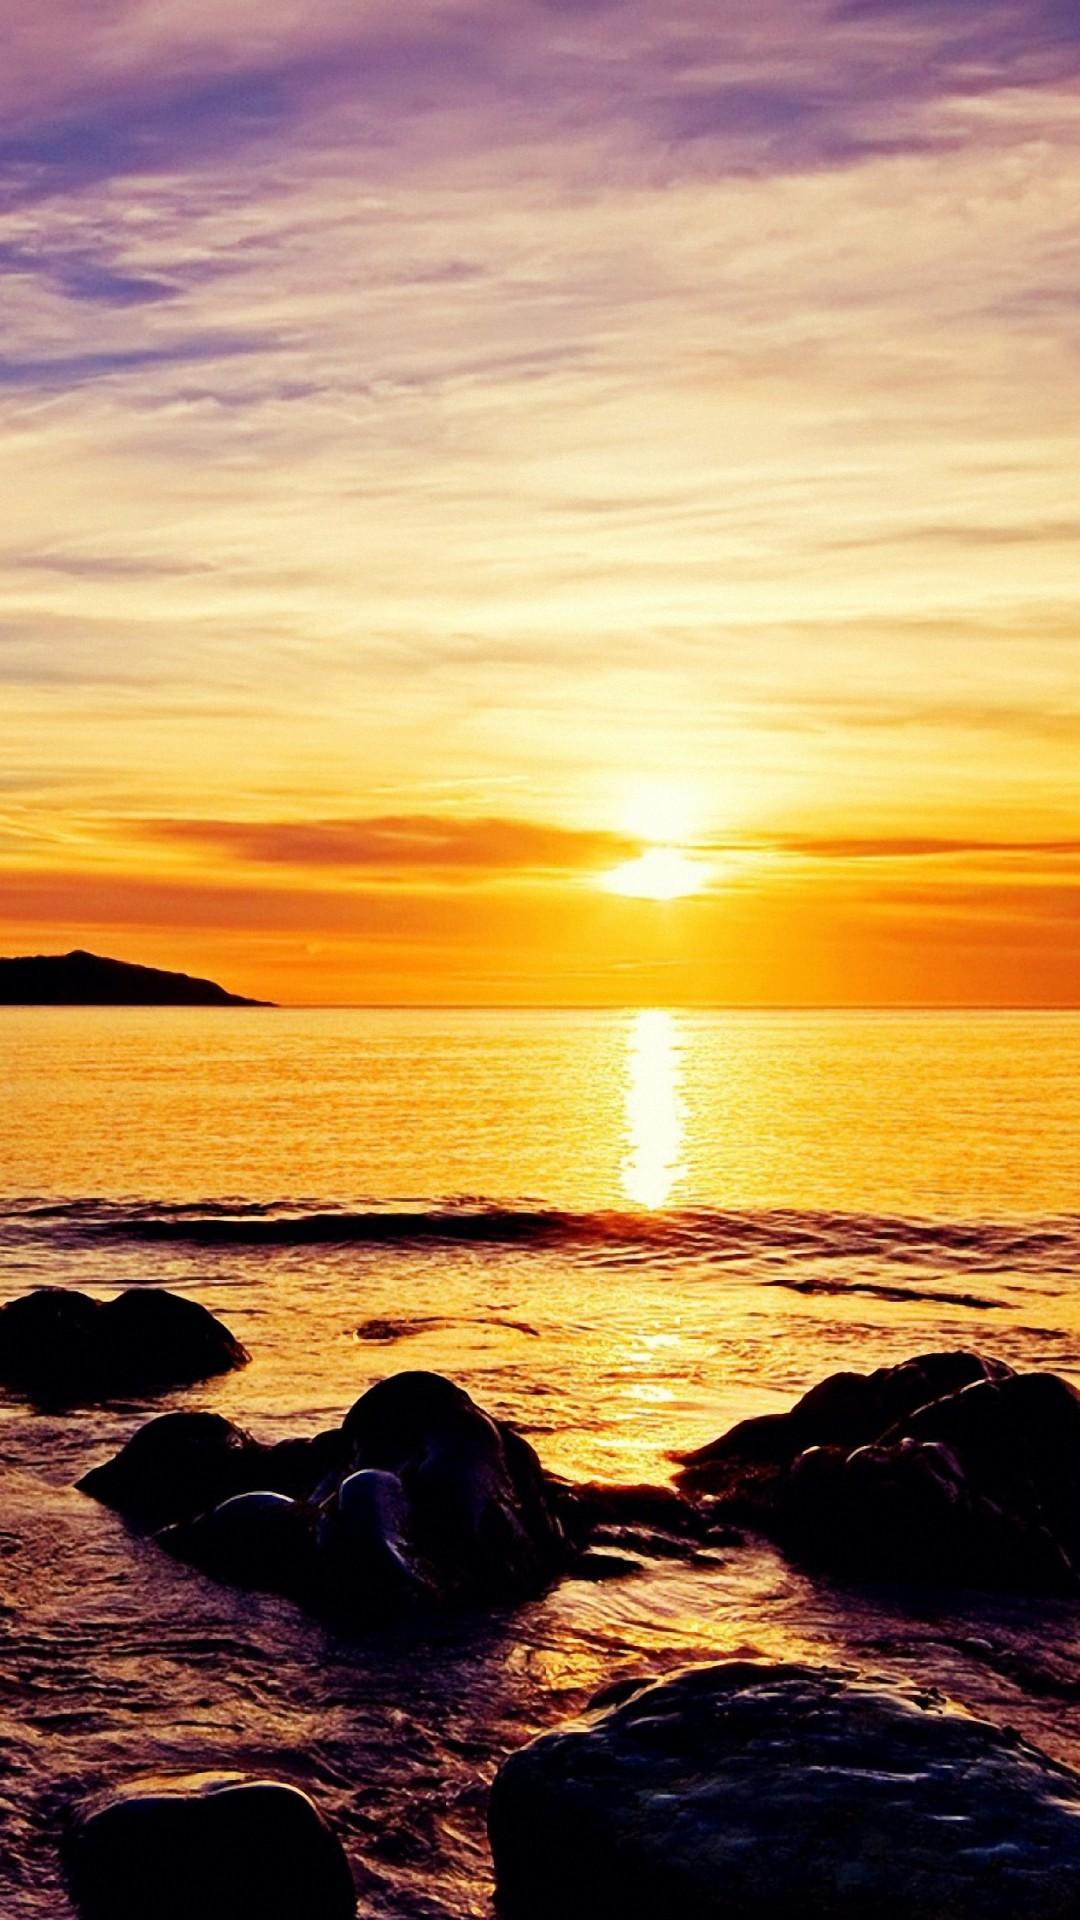 Sunrise Beach Iphone 6s Wallpaper Iphone Wallpaper